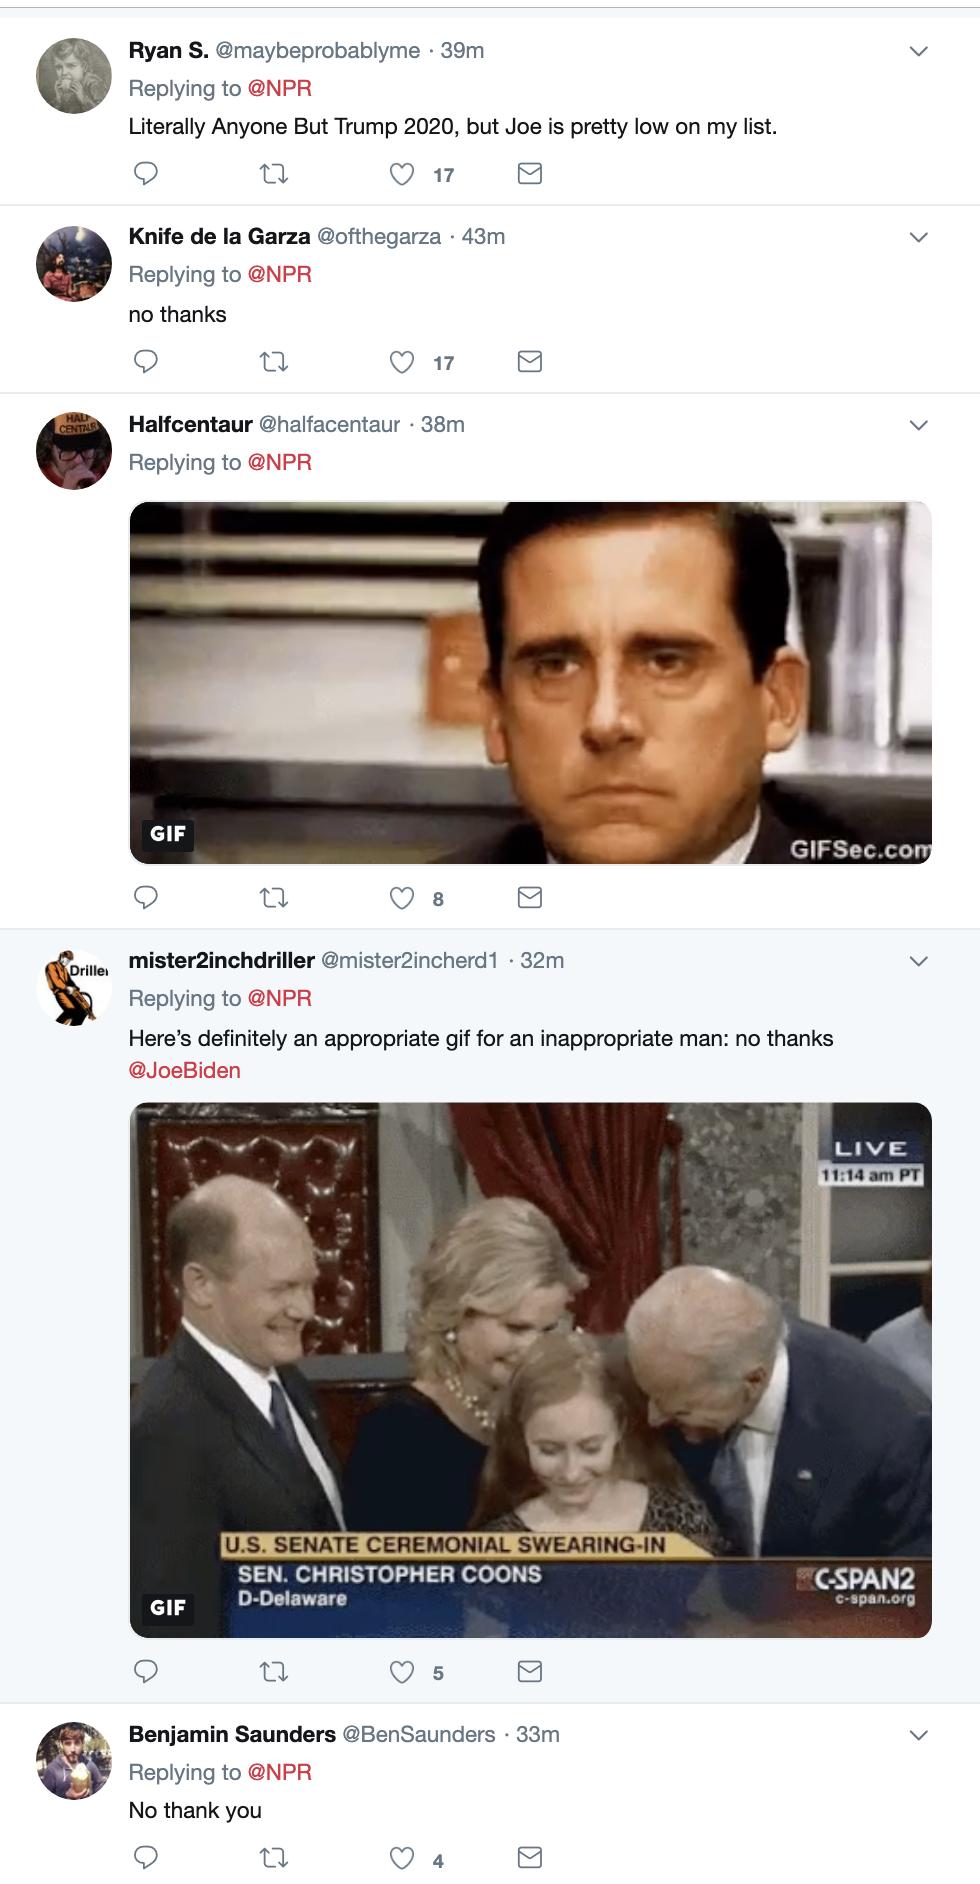 Screen-Shot-2019-04-25-at-9.56.51-AM Obama Responds To Biden's 2020 Bid & Trump Literally Can't Stand It Donald Trump Election 2020 Politics Top Stories